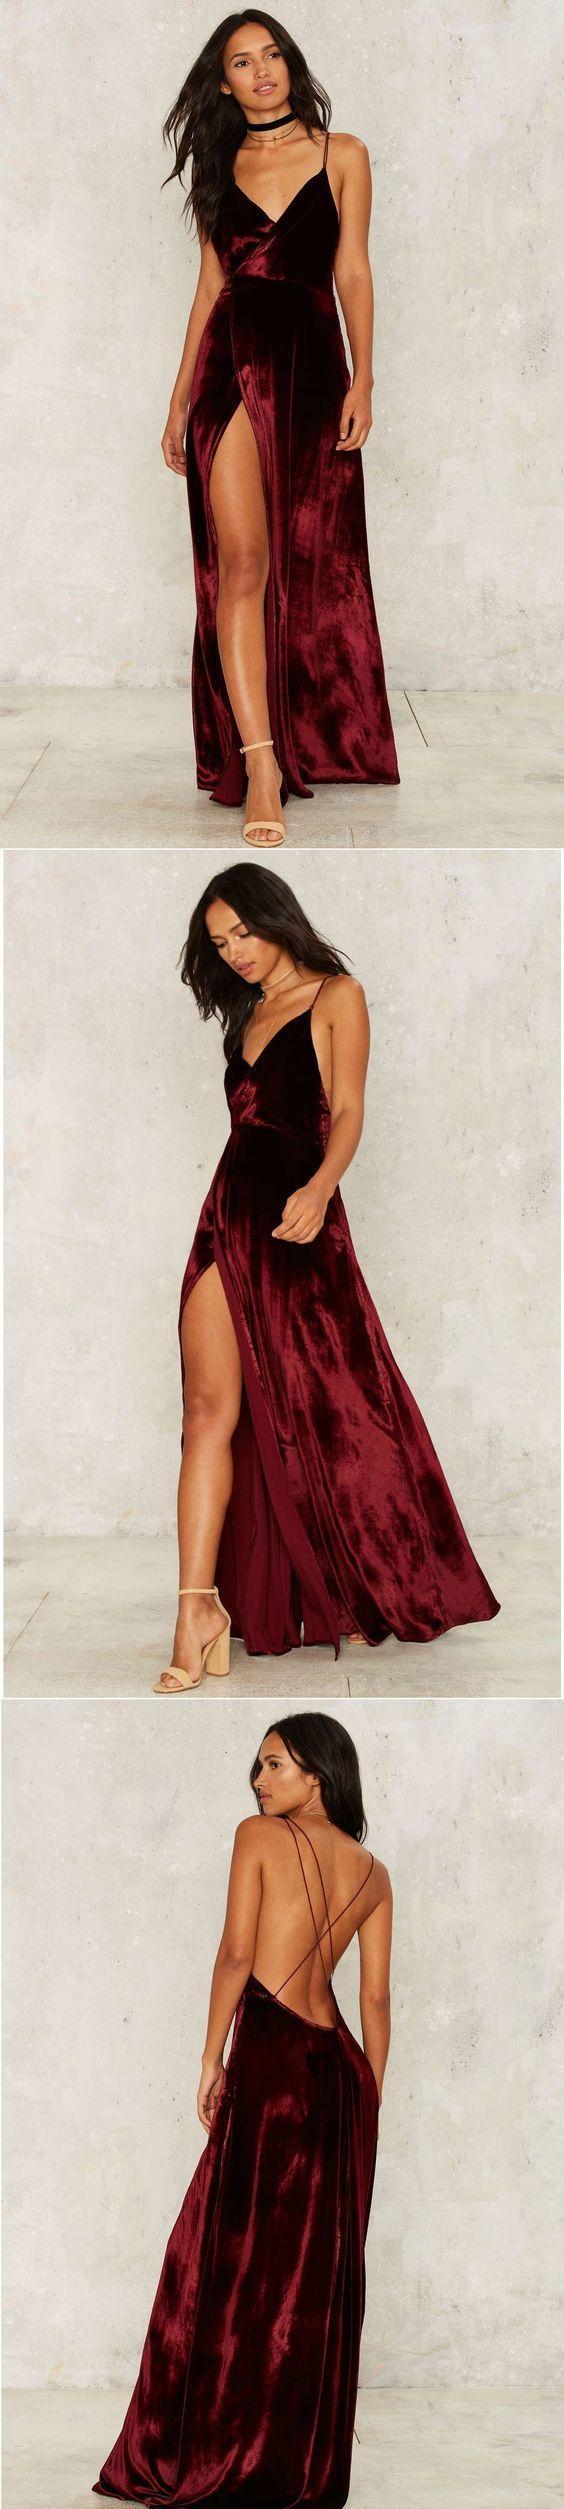 Modest Prom Dress,2017 New Prom Dress,Long Prom Dresses,Burgundy Evening Dress,Sexy Spaghetti Straps Slit Evening Dress by DestinyDress, $177.39 USD